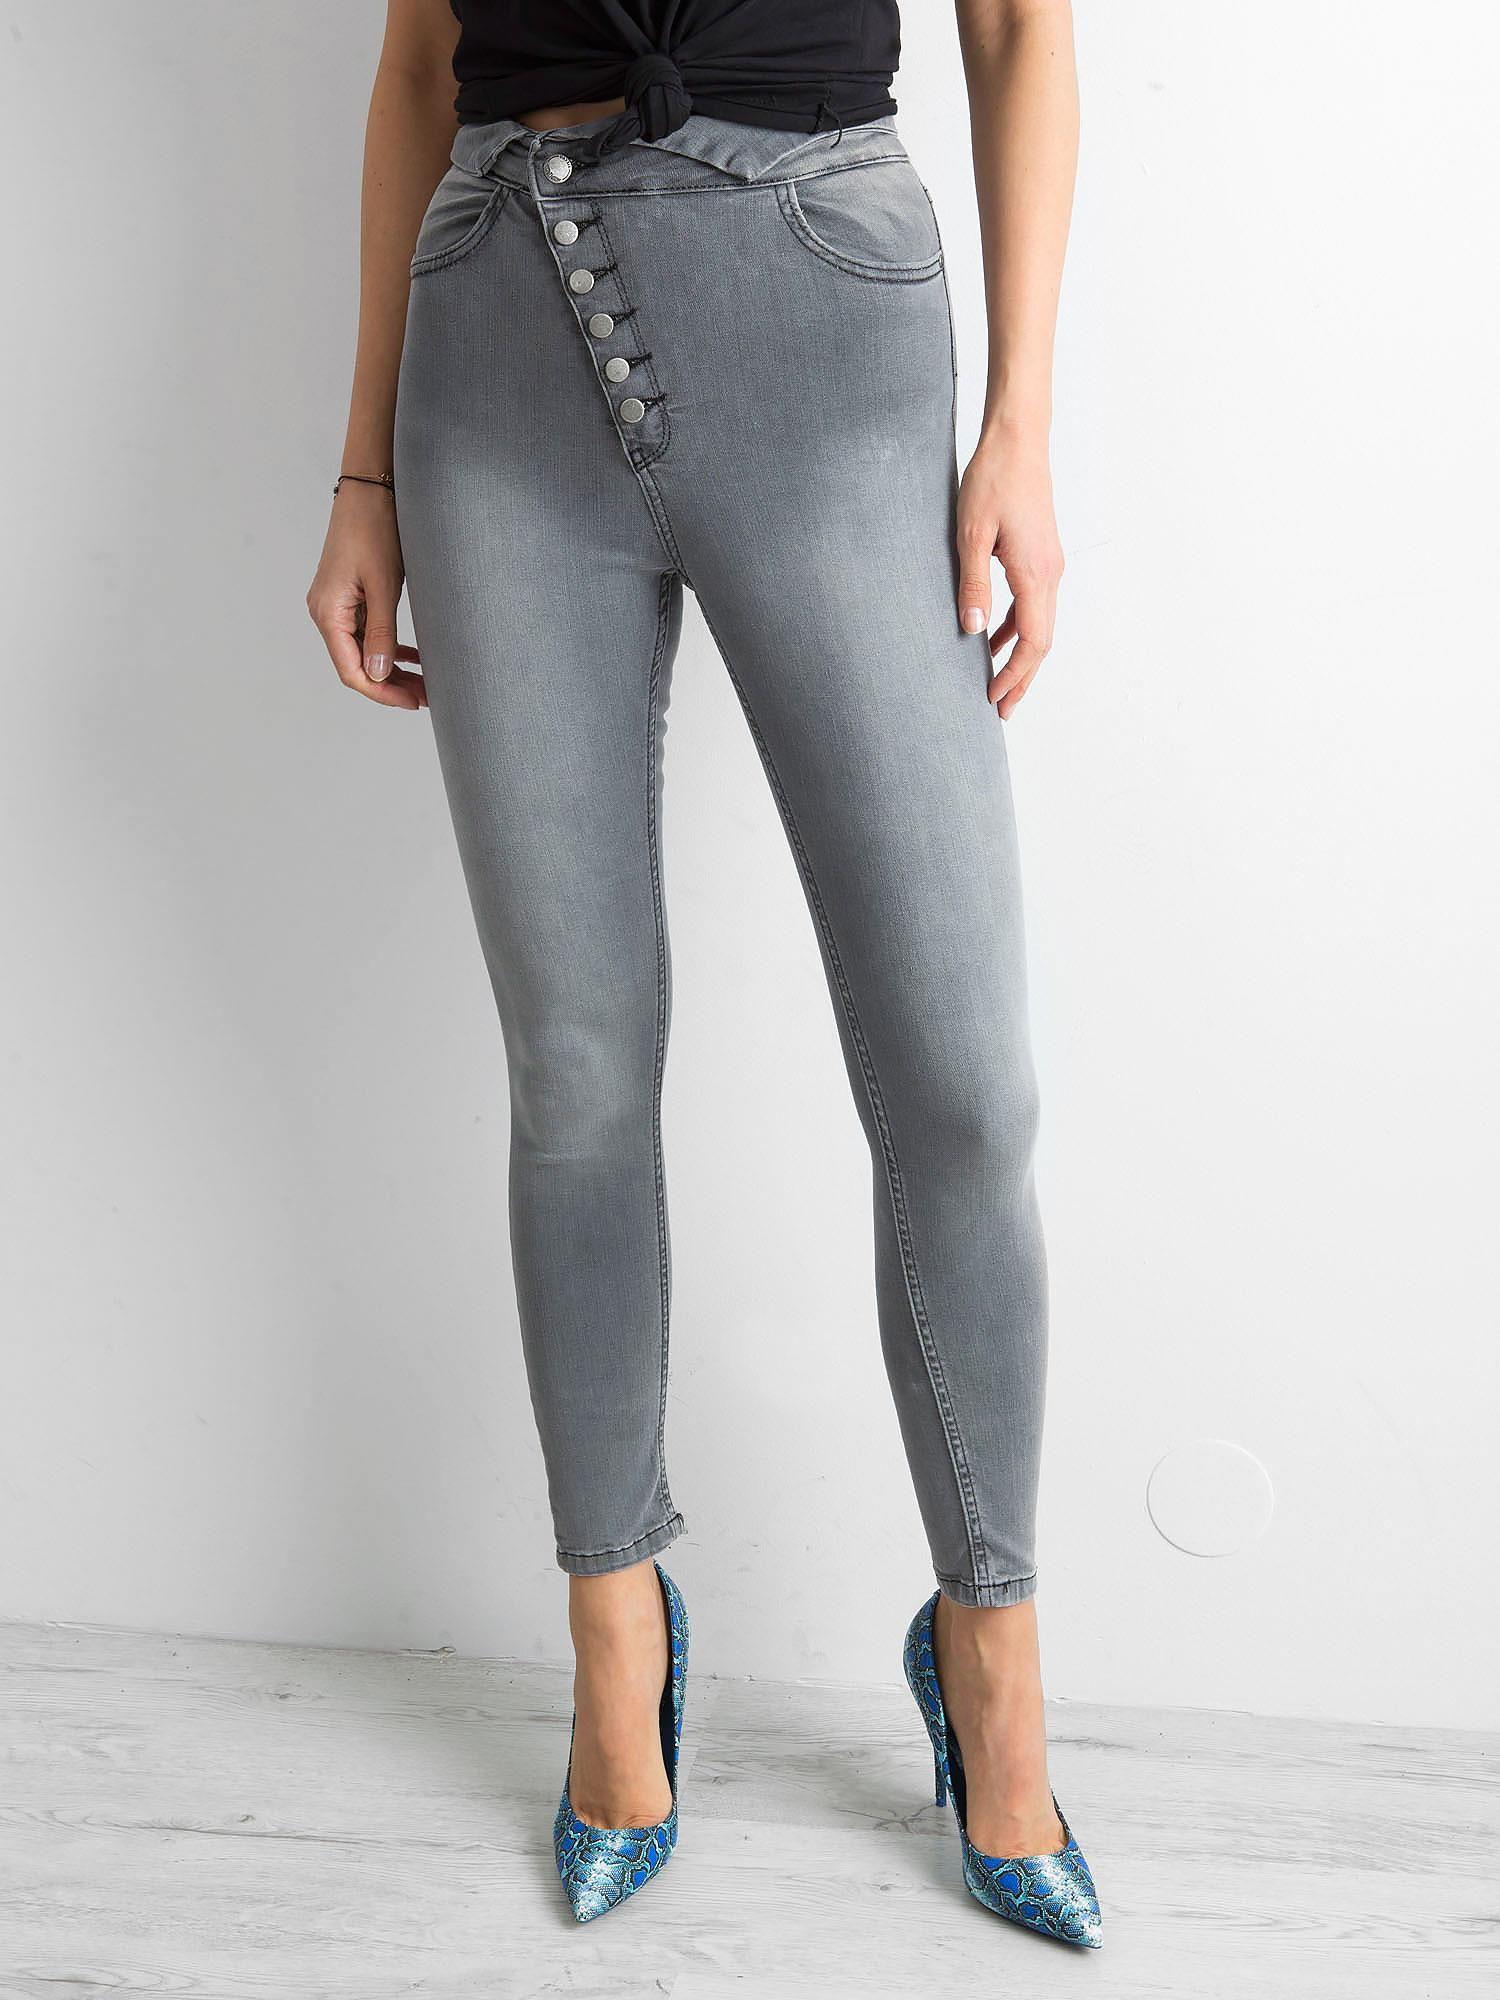 27ecf8b2 Szare jeansy skinny high waist